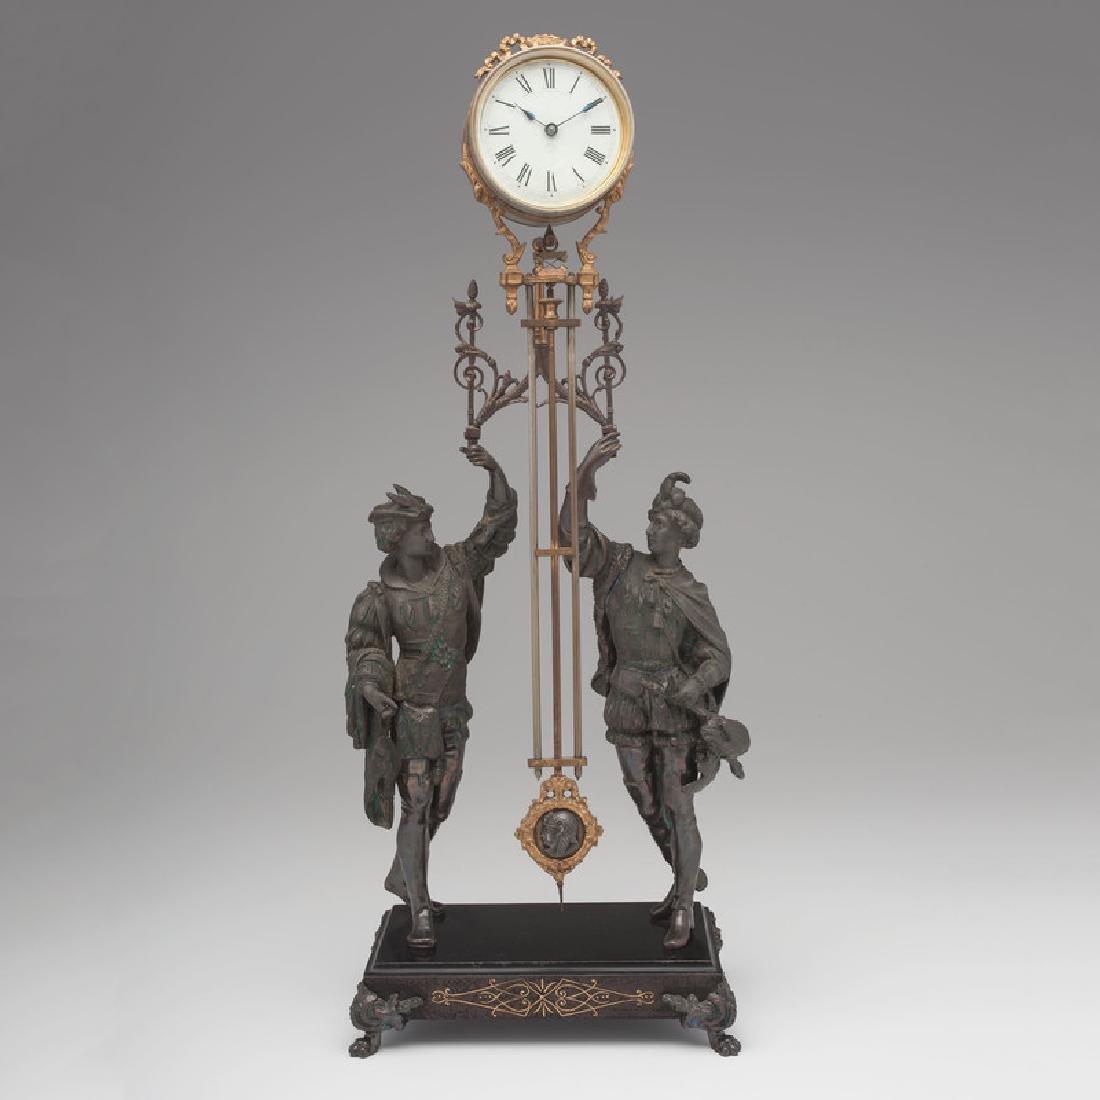 Ansonia Swing Clock, Fisher & Falconer